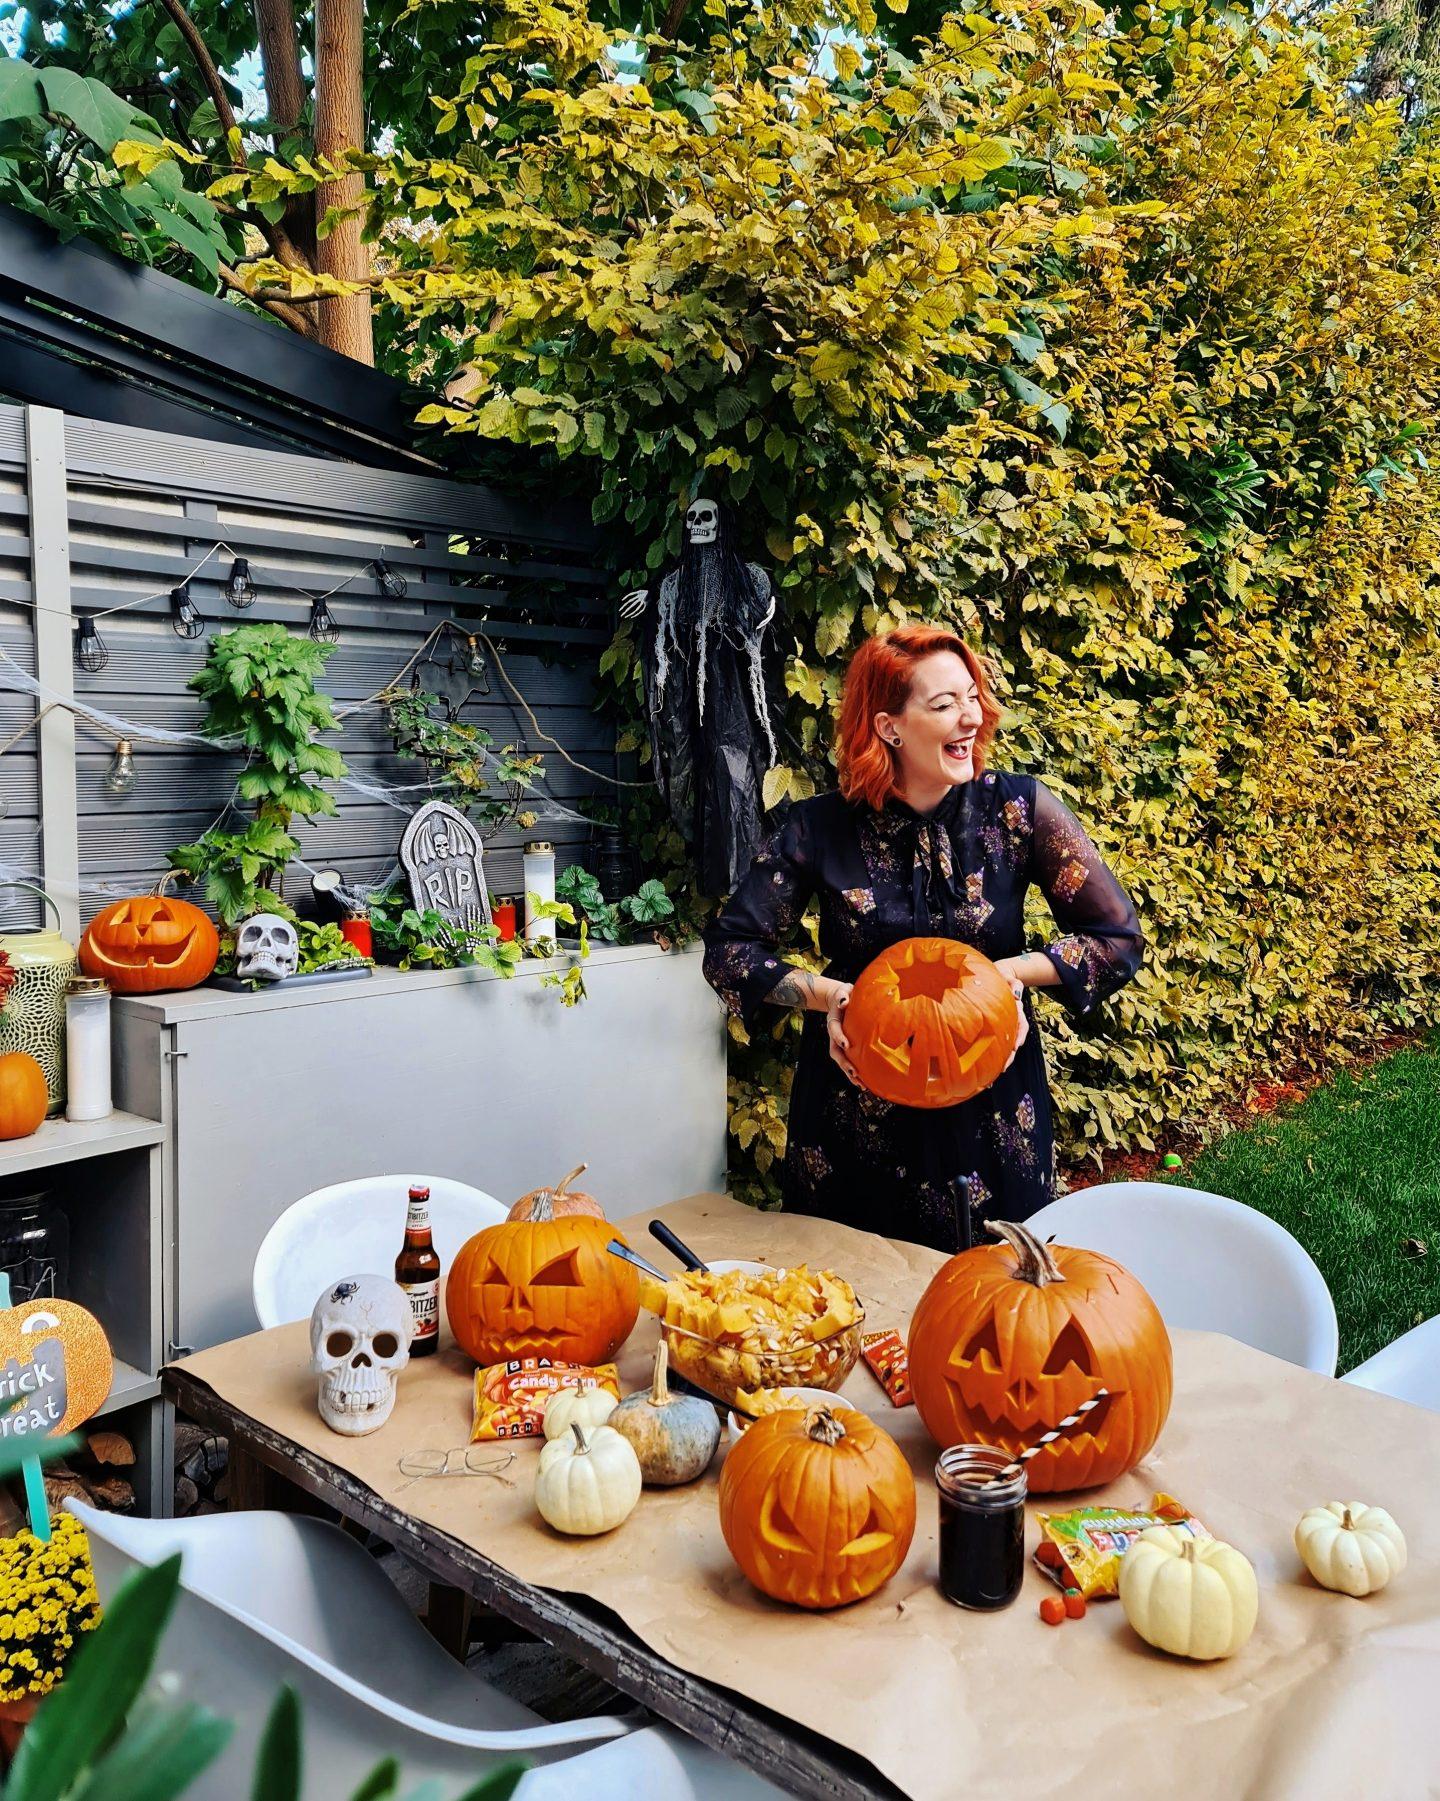 Inspiration Spooky Doobi Boo Pumpkin Carving Und Halloween Deko Im Garten New Vlog Starlights In The Kitchen